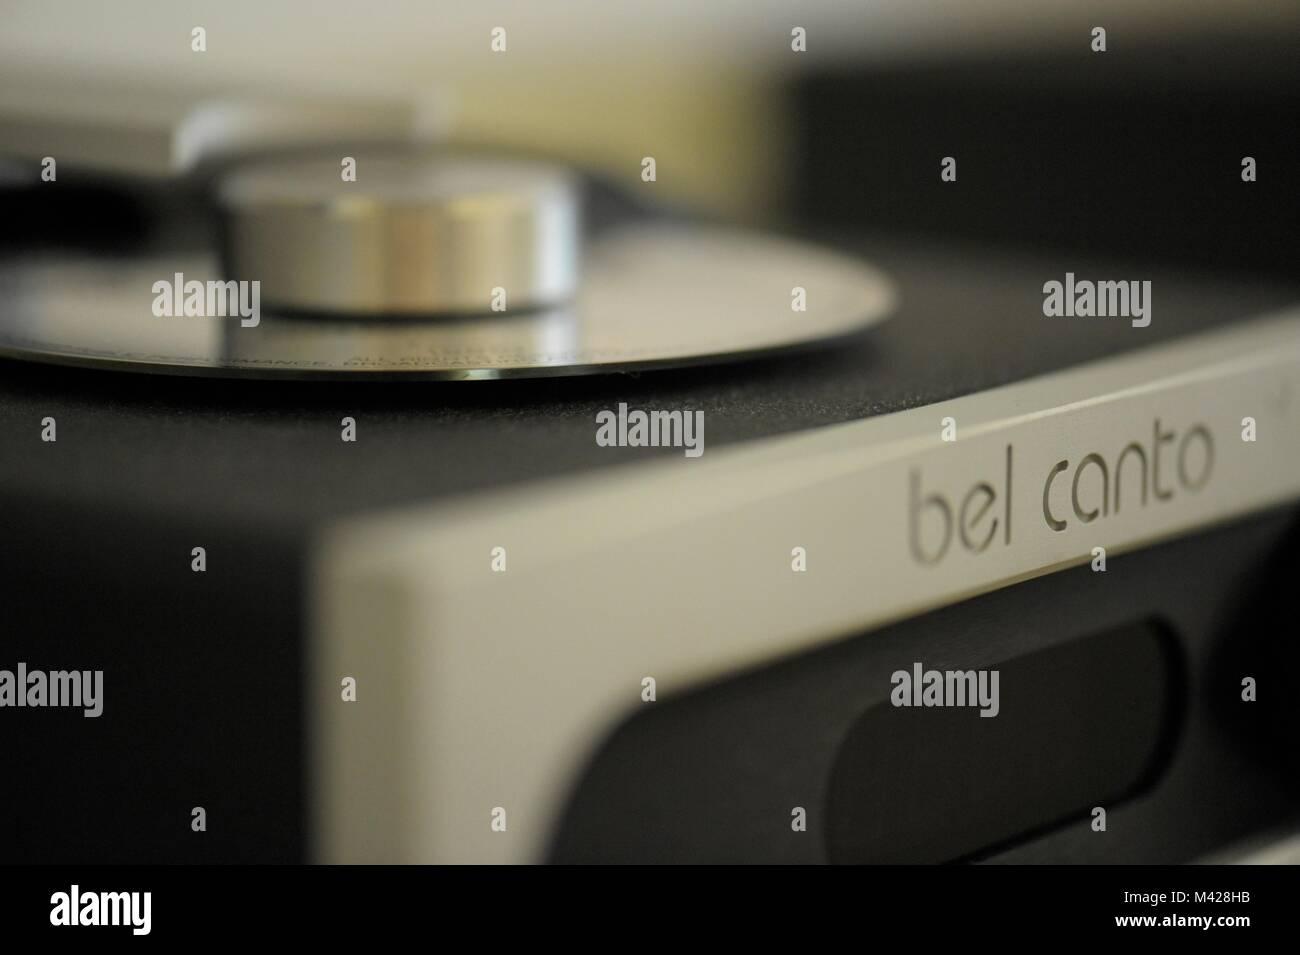 Stereo, high fidelity equipment - Stock Image